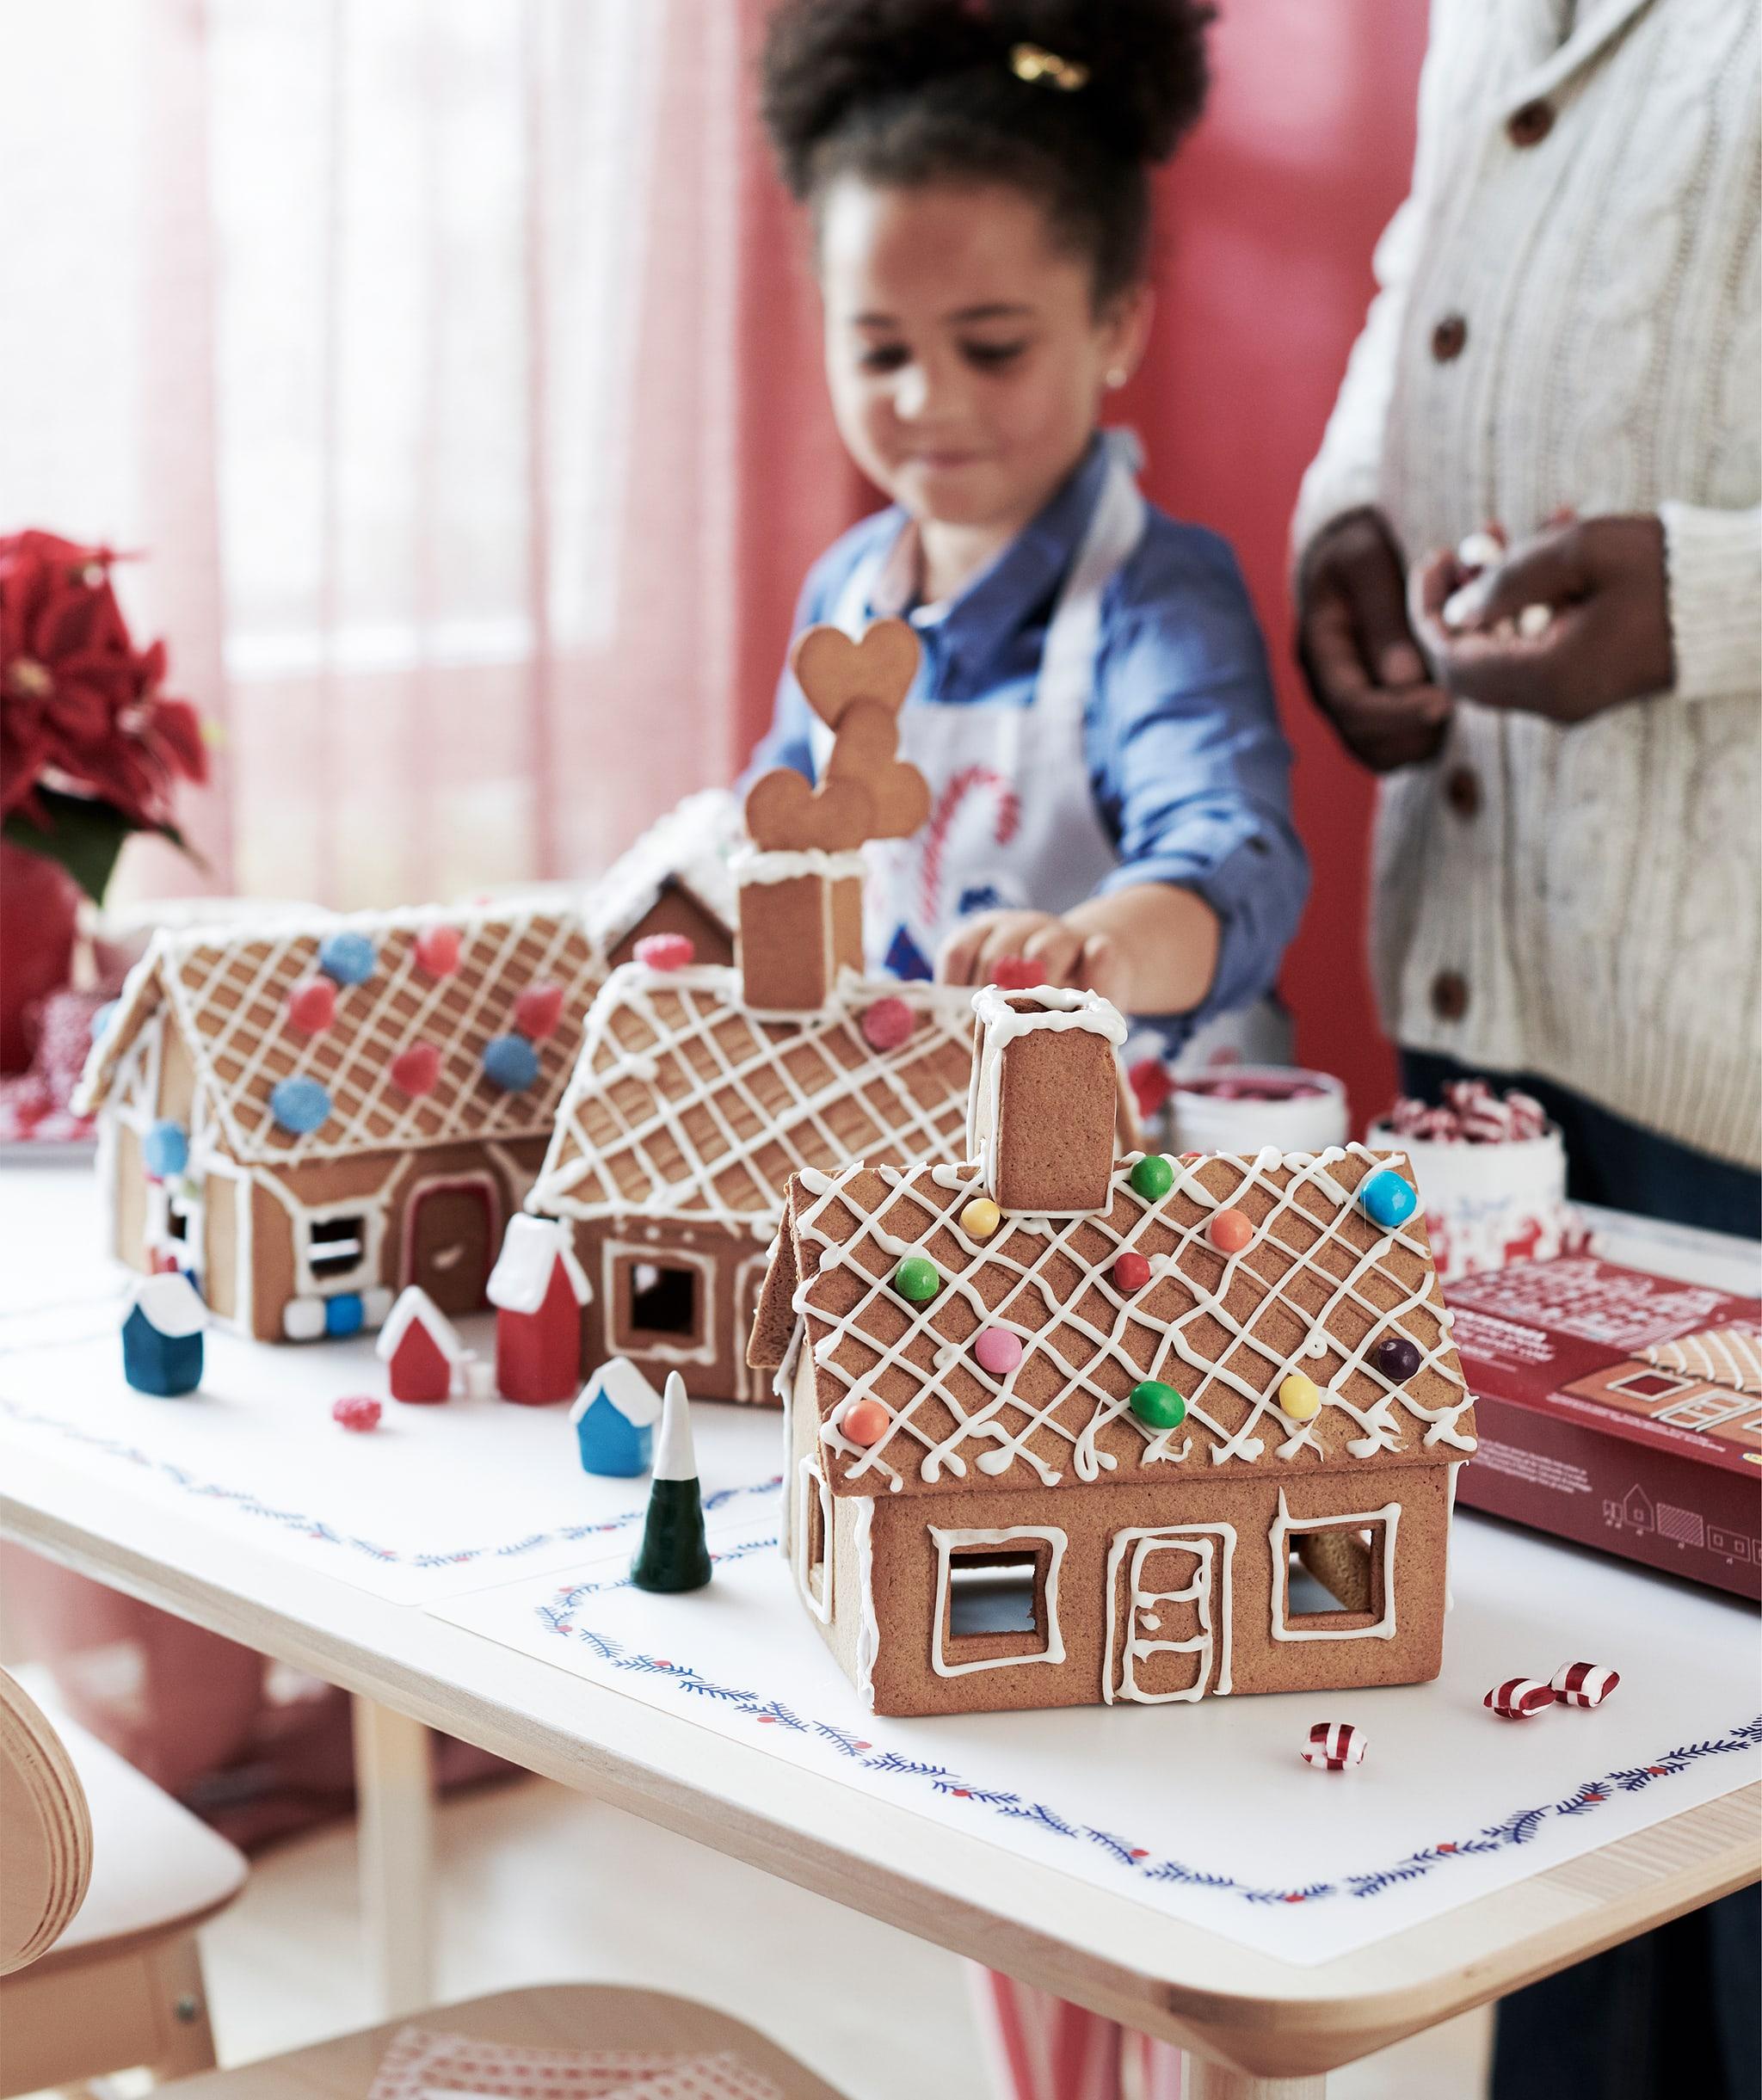 Seorang anak kecil dan orang dewasa berdiri di samping meja tempat meletakkan beberapa rumah kue jahe yang telah selesai dihias dengan rapi menggunakan lapisan gula.